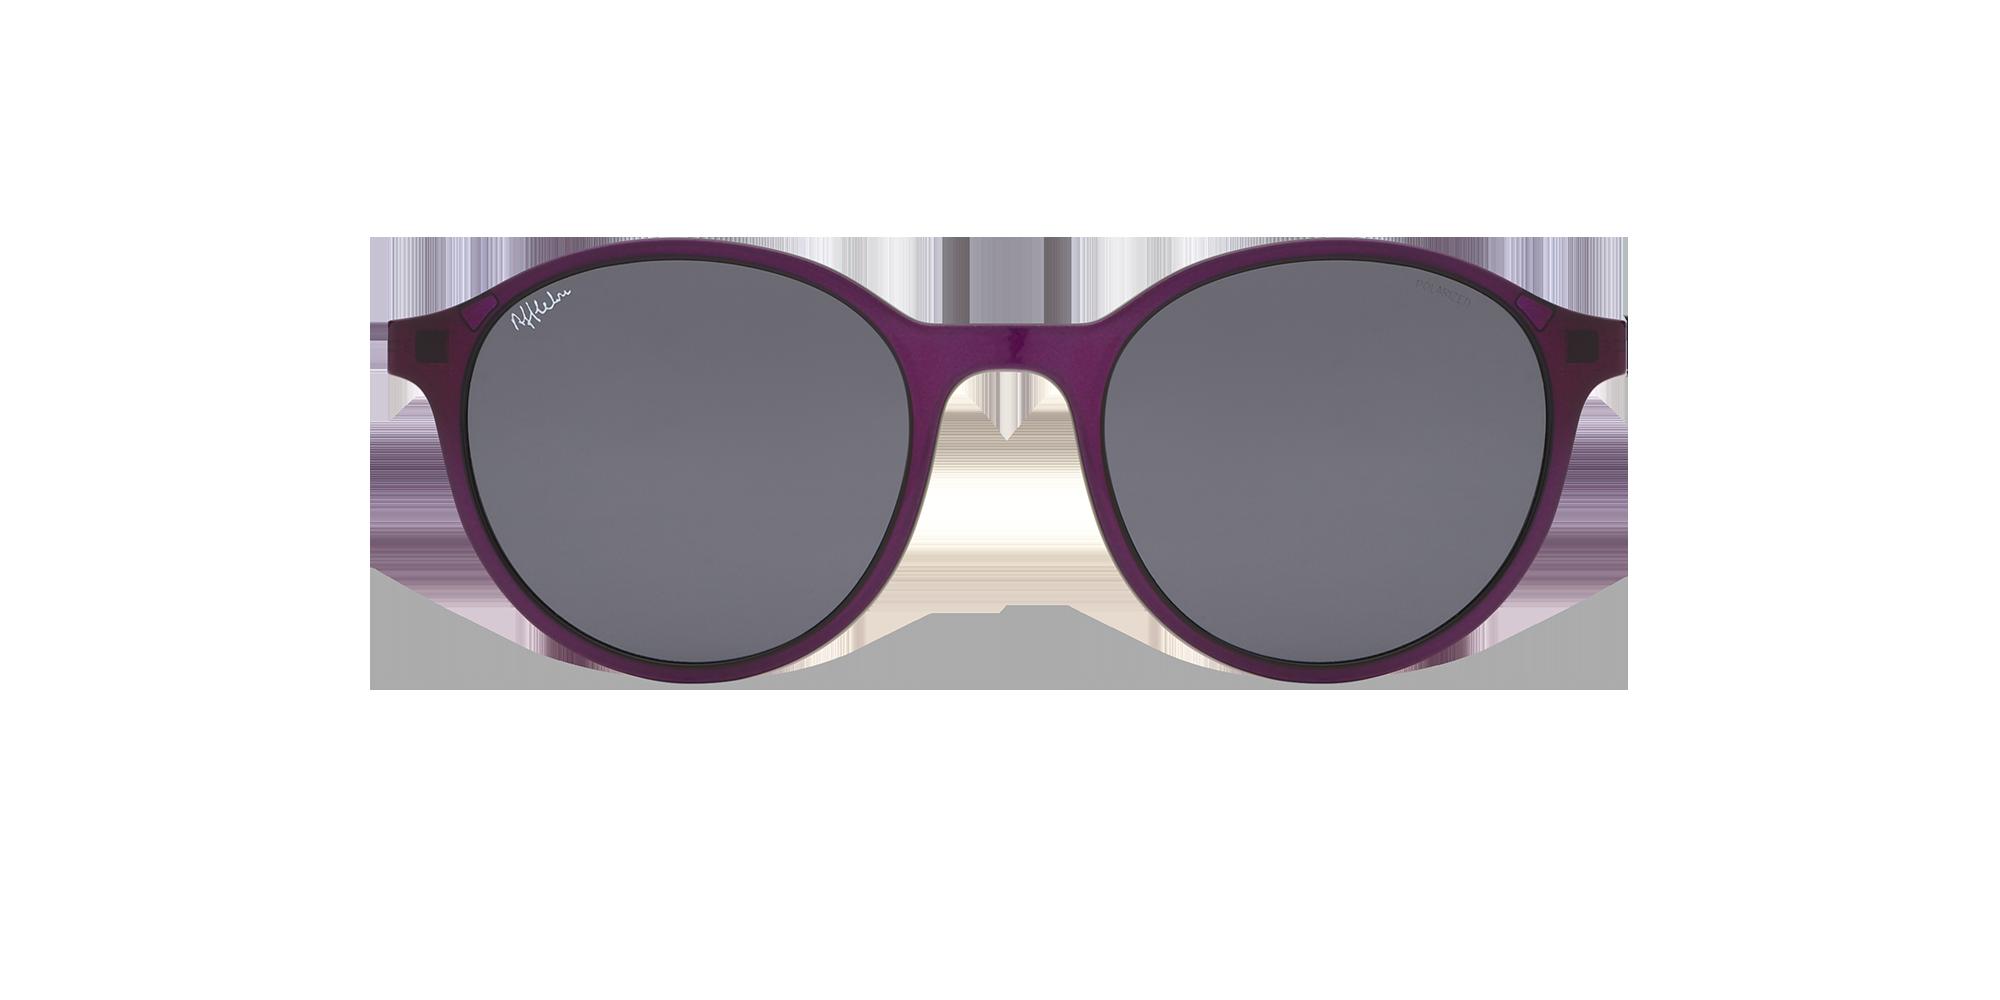 afflelou/france/products/smart_clip/clips_glasses/TMK37POPU014919.png